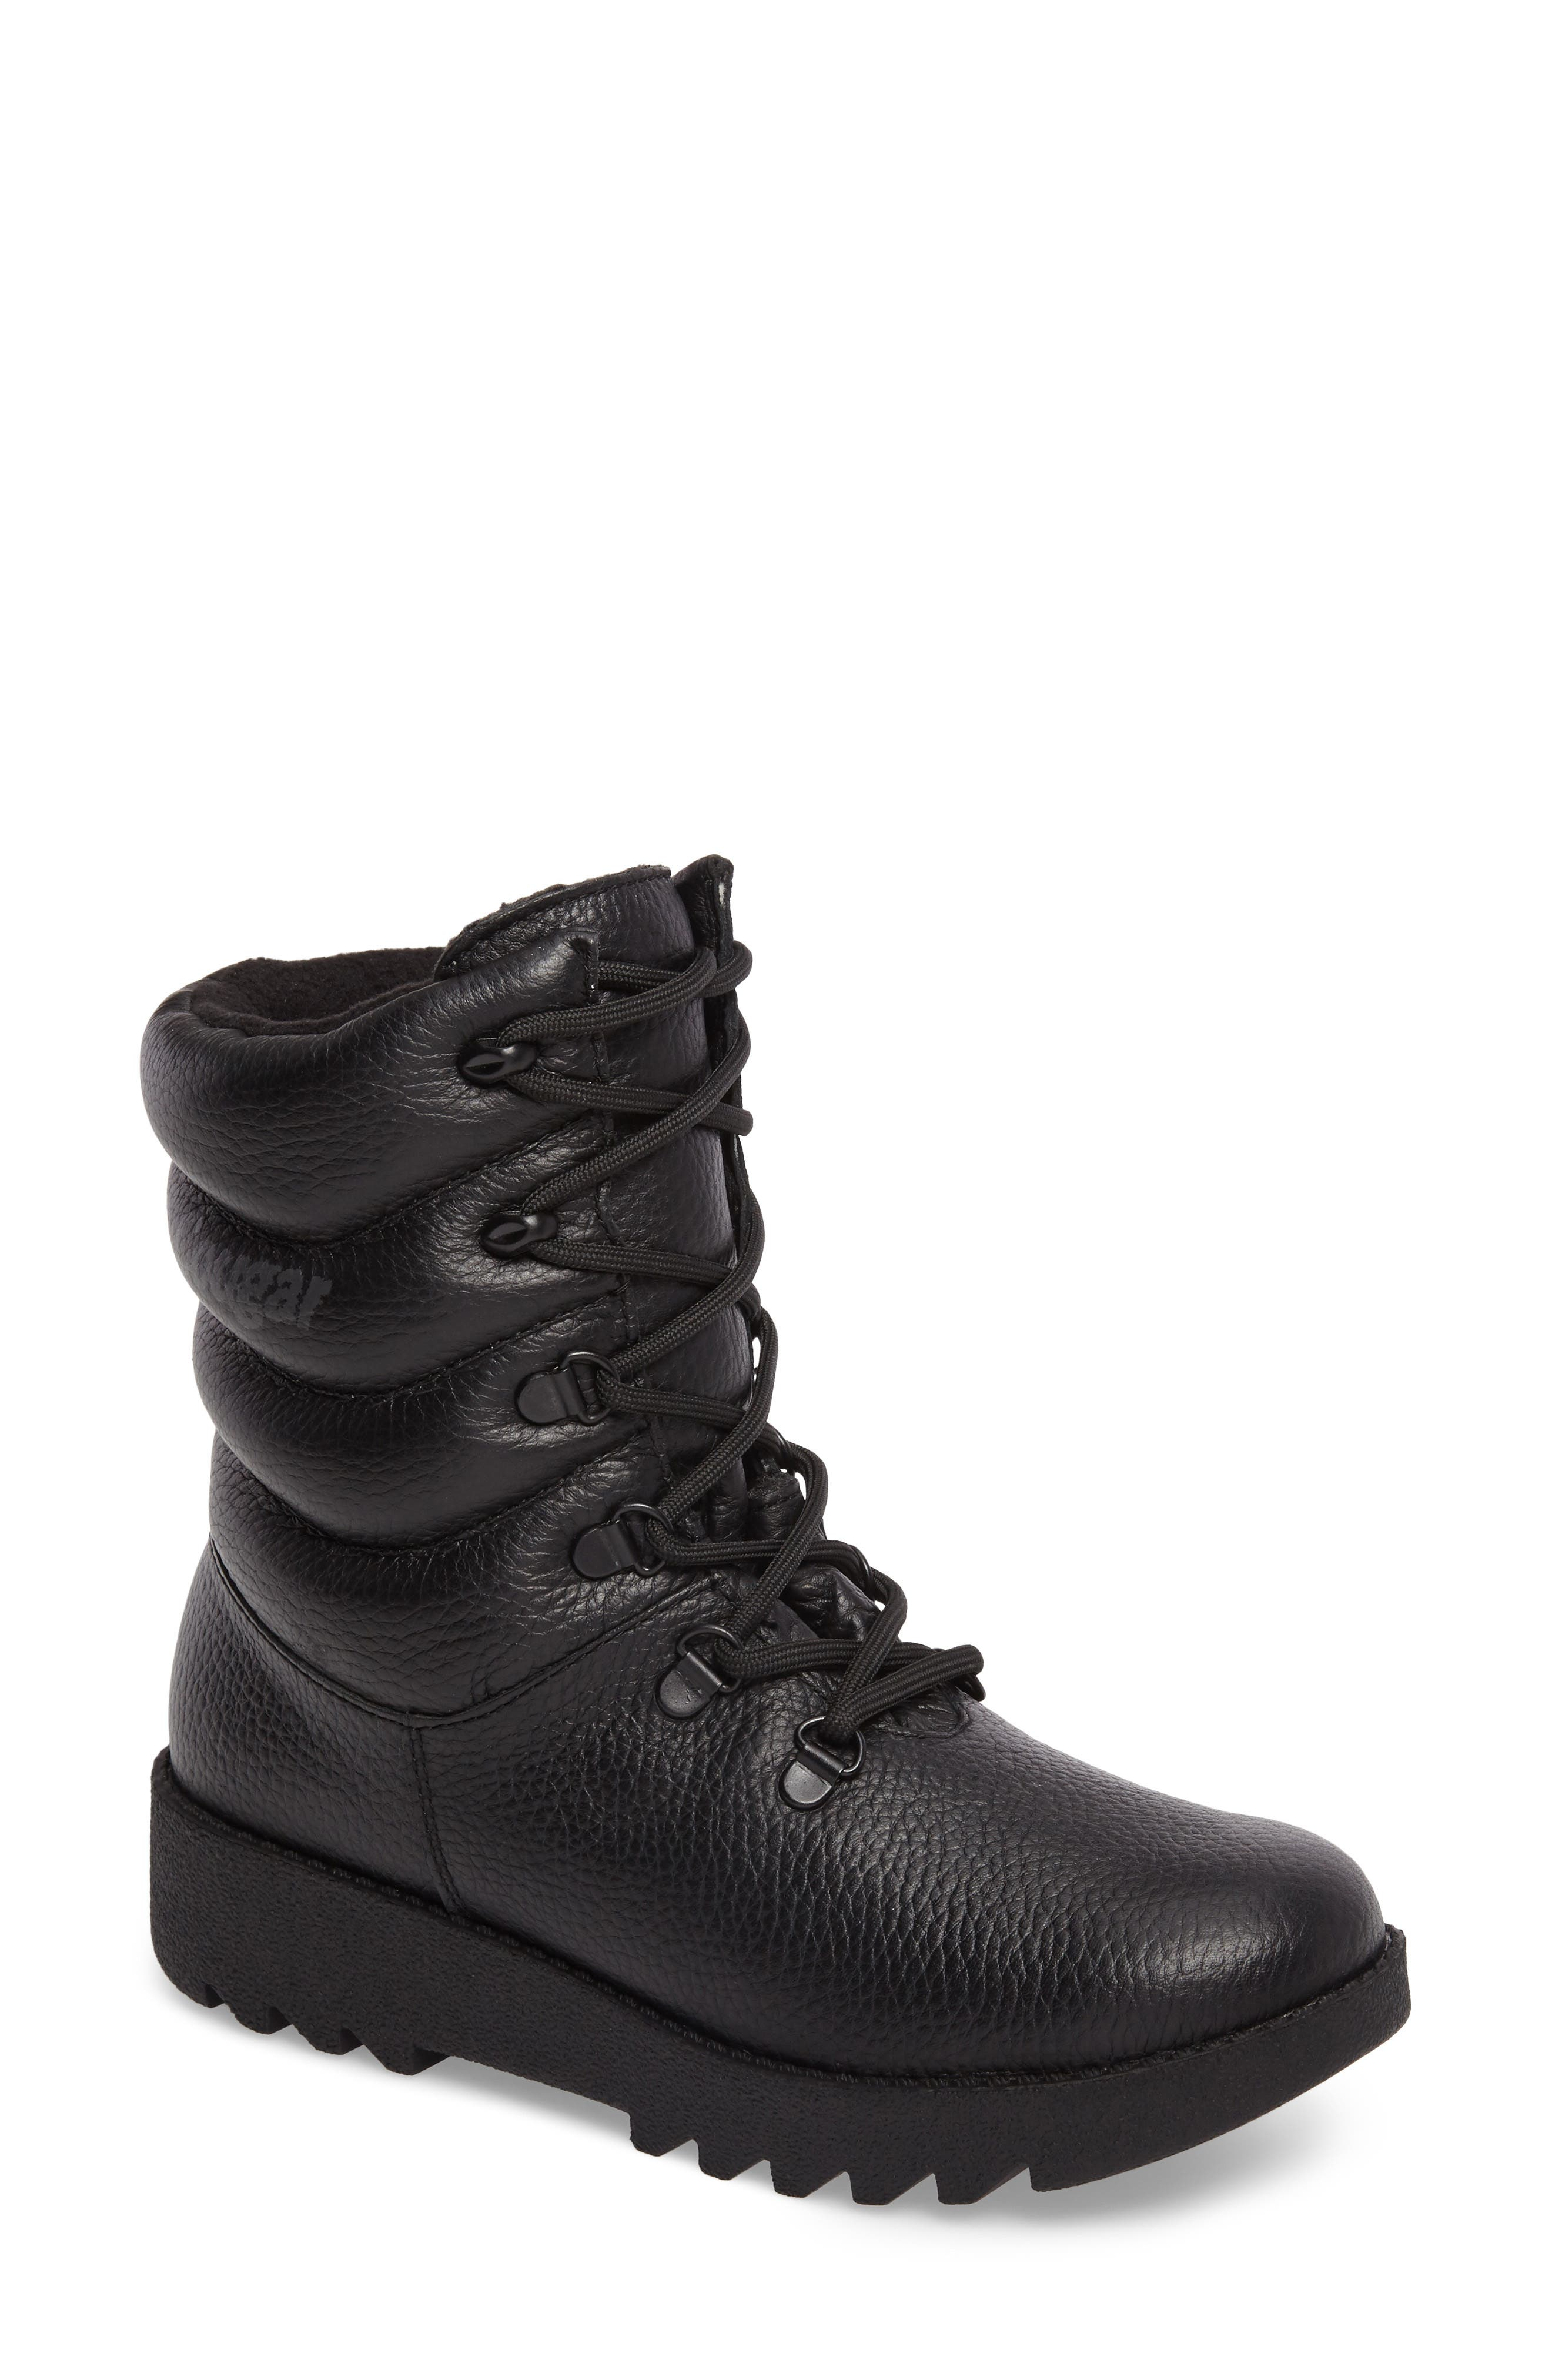 Cougar Blackout Waterproof Boot